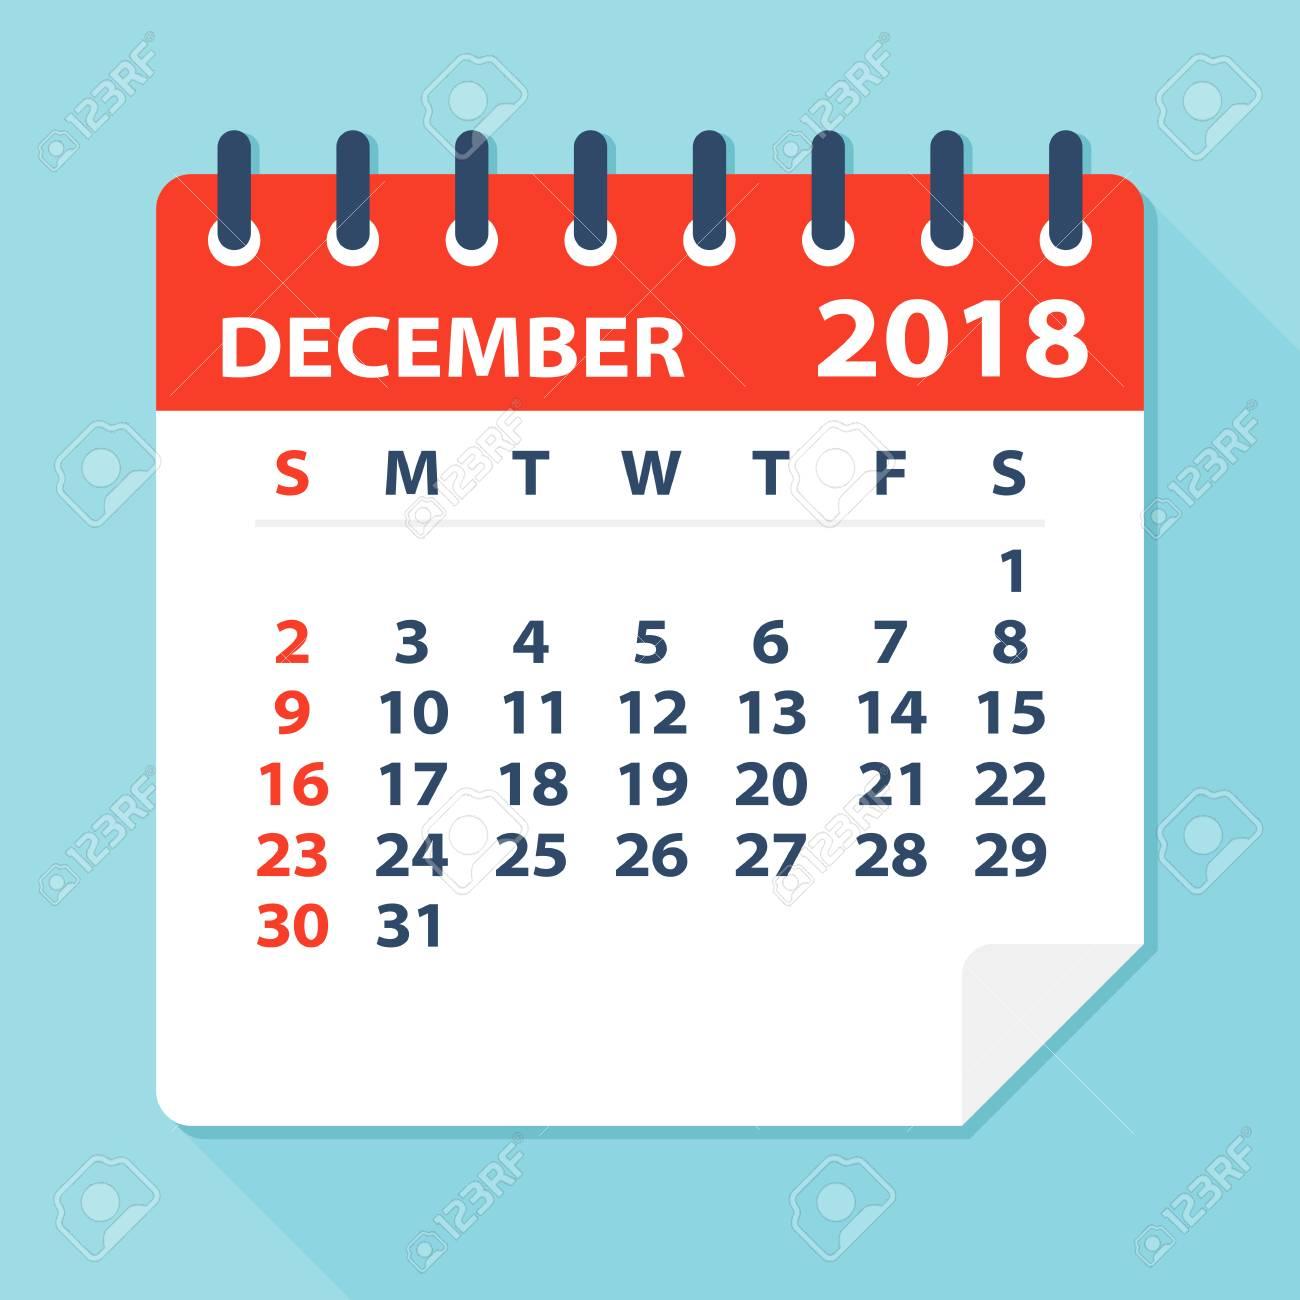 December 2019 Calendar With Clipart December 2018 Calendar Leaf   Flat Vector Illustration Royalty